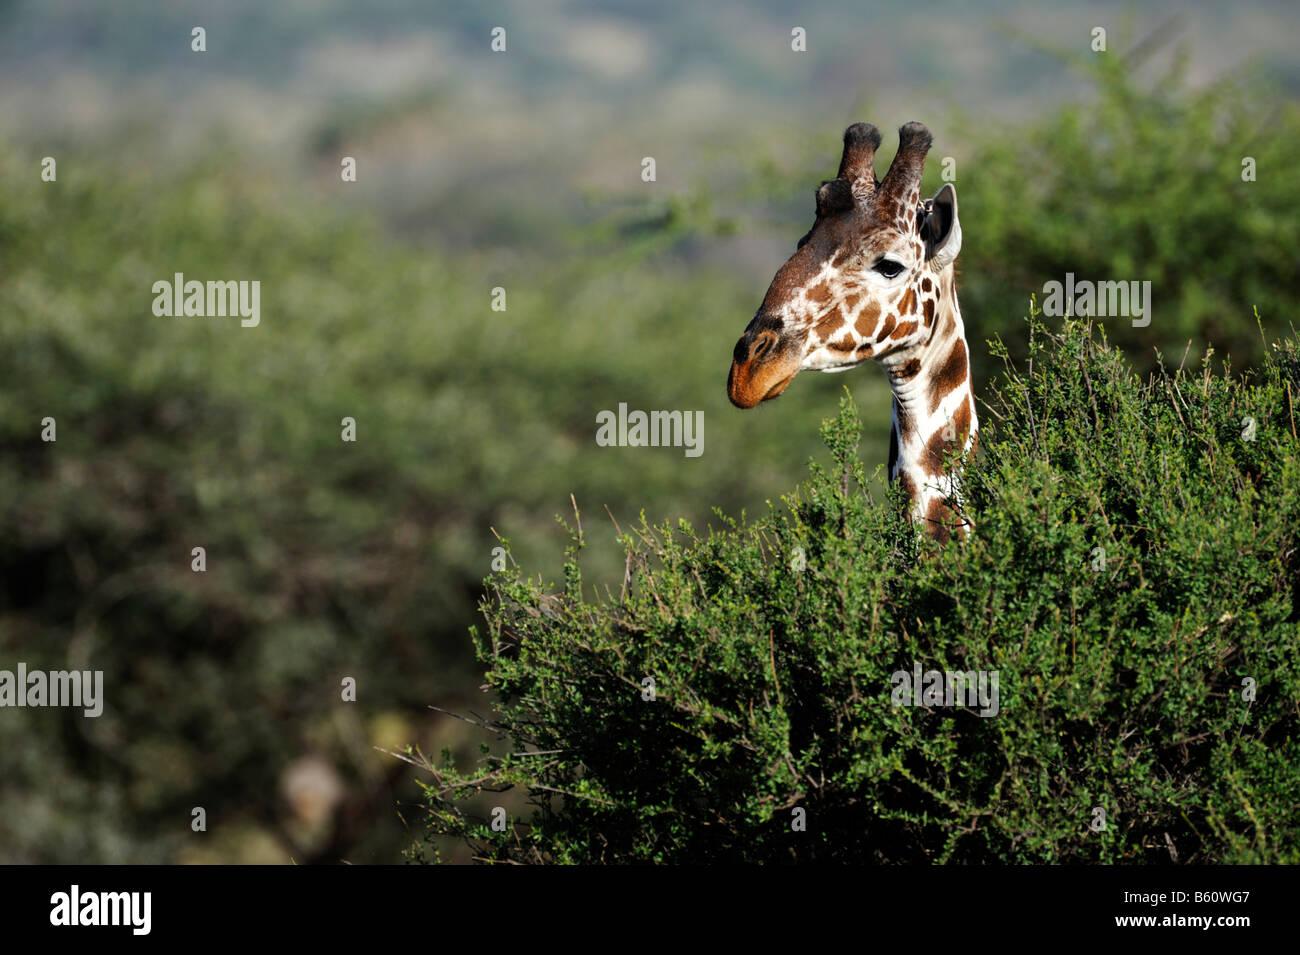 Girafe réticulée ou somaliens Girafe (Giraffa camelopardalis reticulata), portrait, Samburu National Reserve, Kenya Banque D'Images